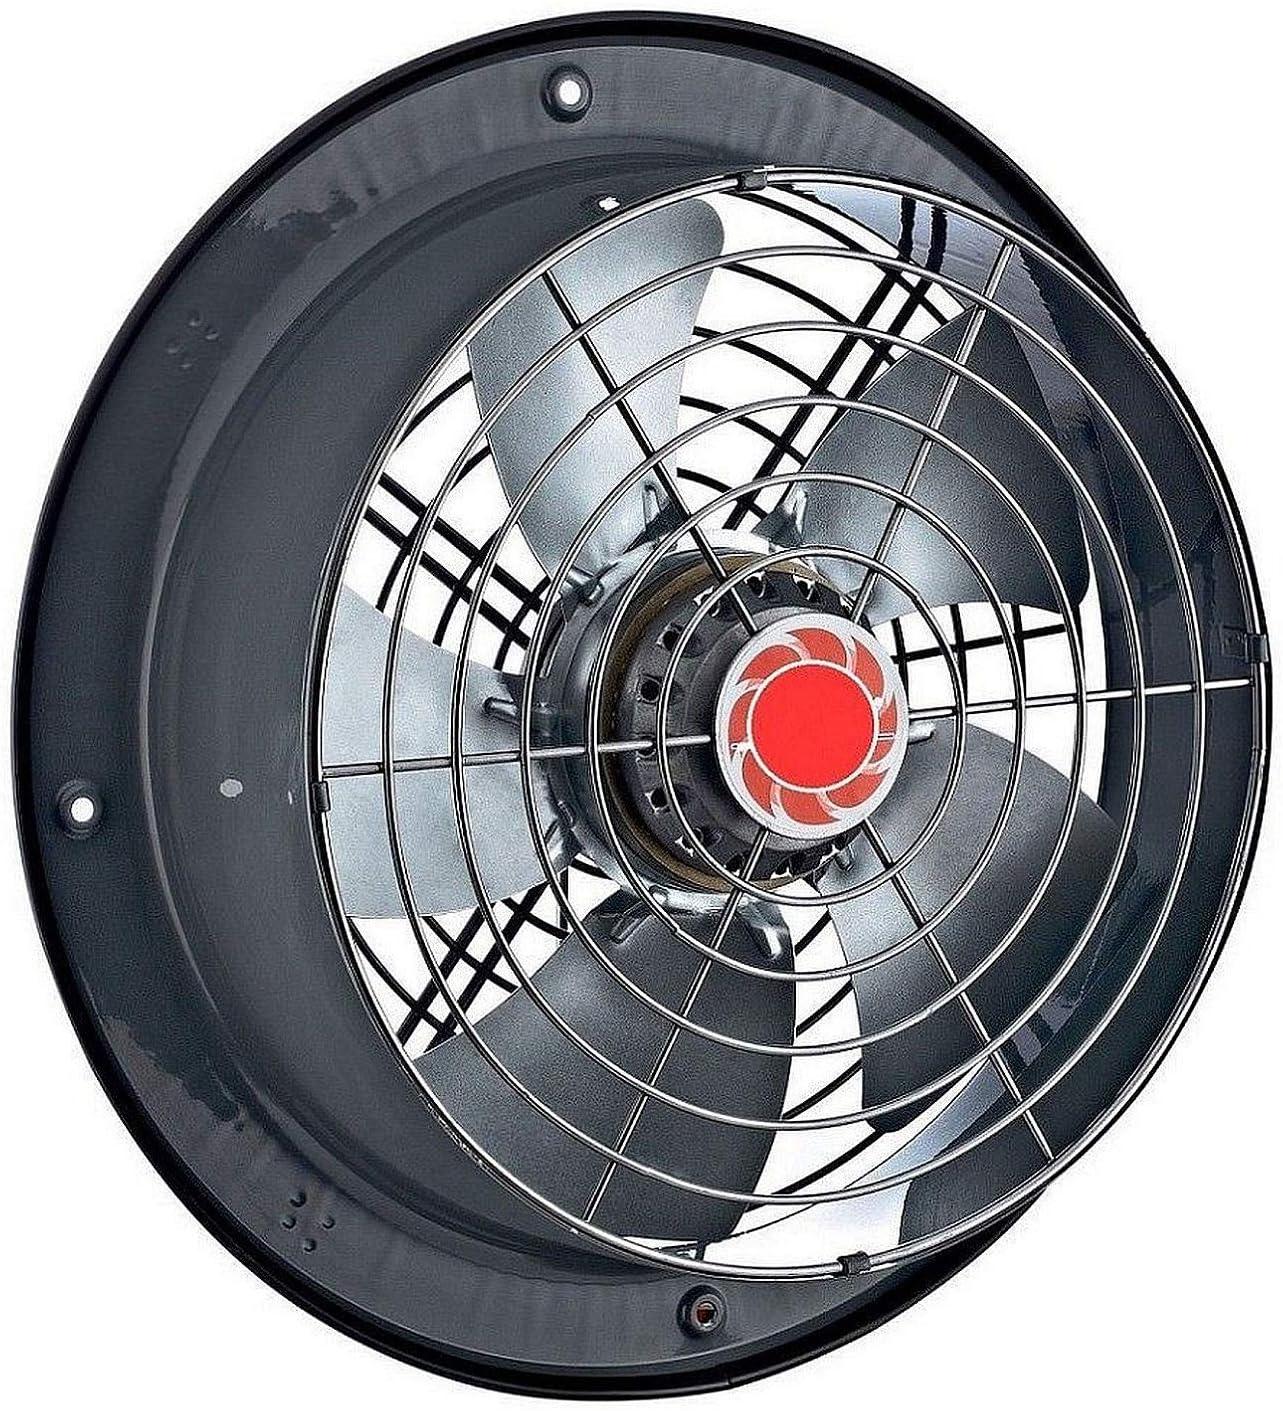 BDRAX 250 Industrial Axial Axiales Ventilador Ventilación extractor Ventiladores ventilador Fan Fans industriales extractores centrifugos radiales turbina aspiracion